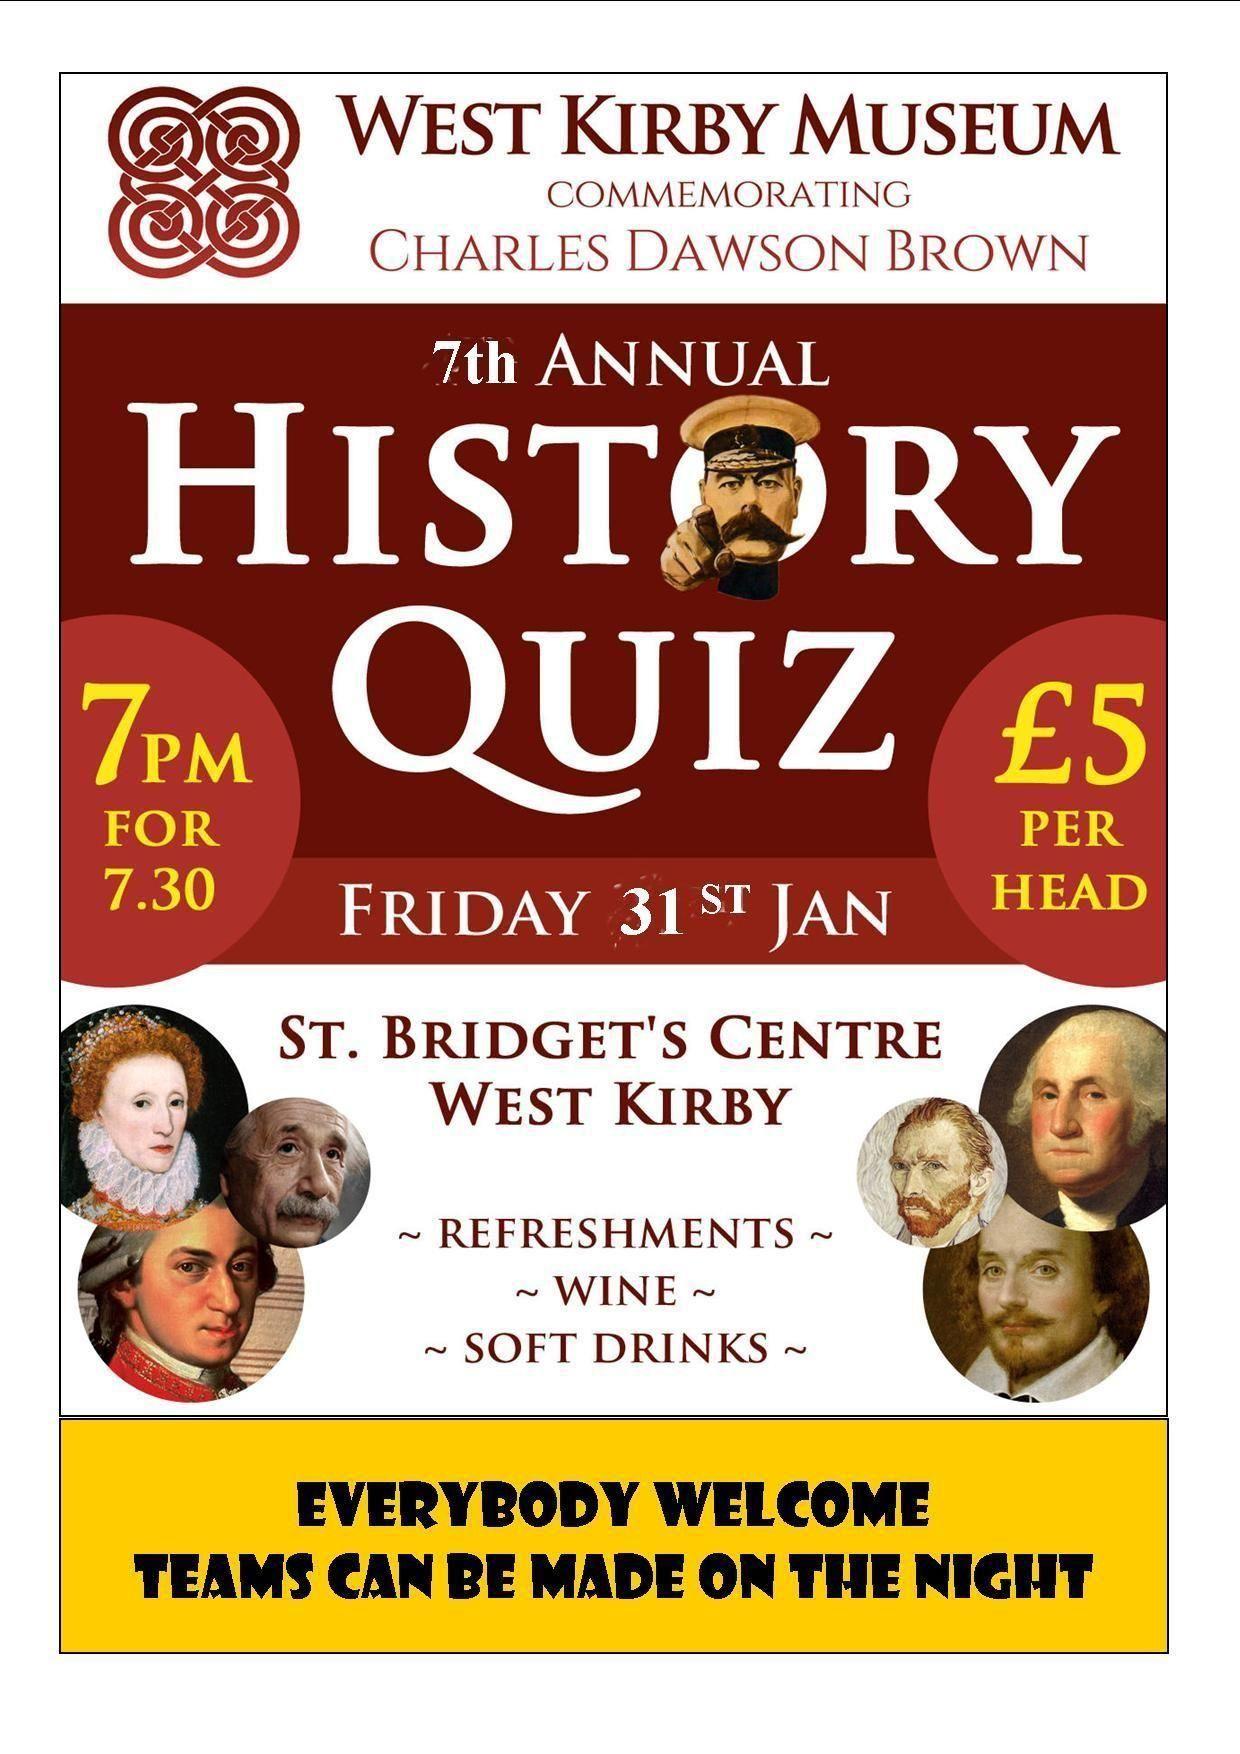 7th Annual History Quiz